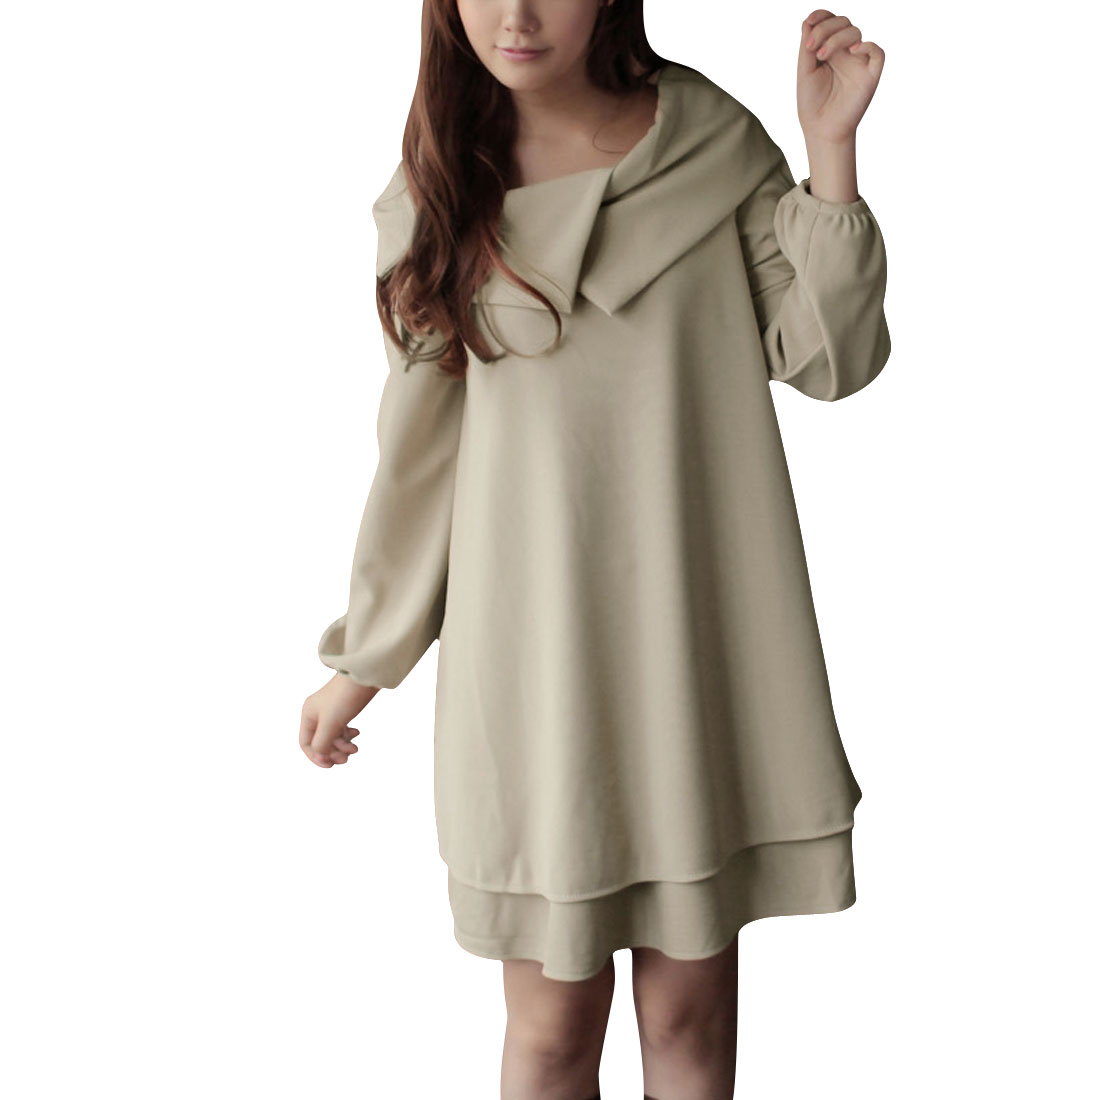 Ladies Beige Side Pockets Tiered Autumn Pullover Fashion Dress S